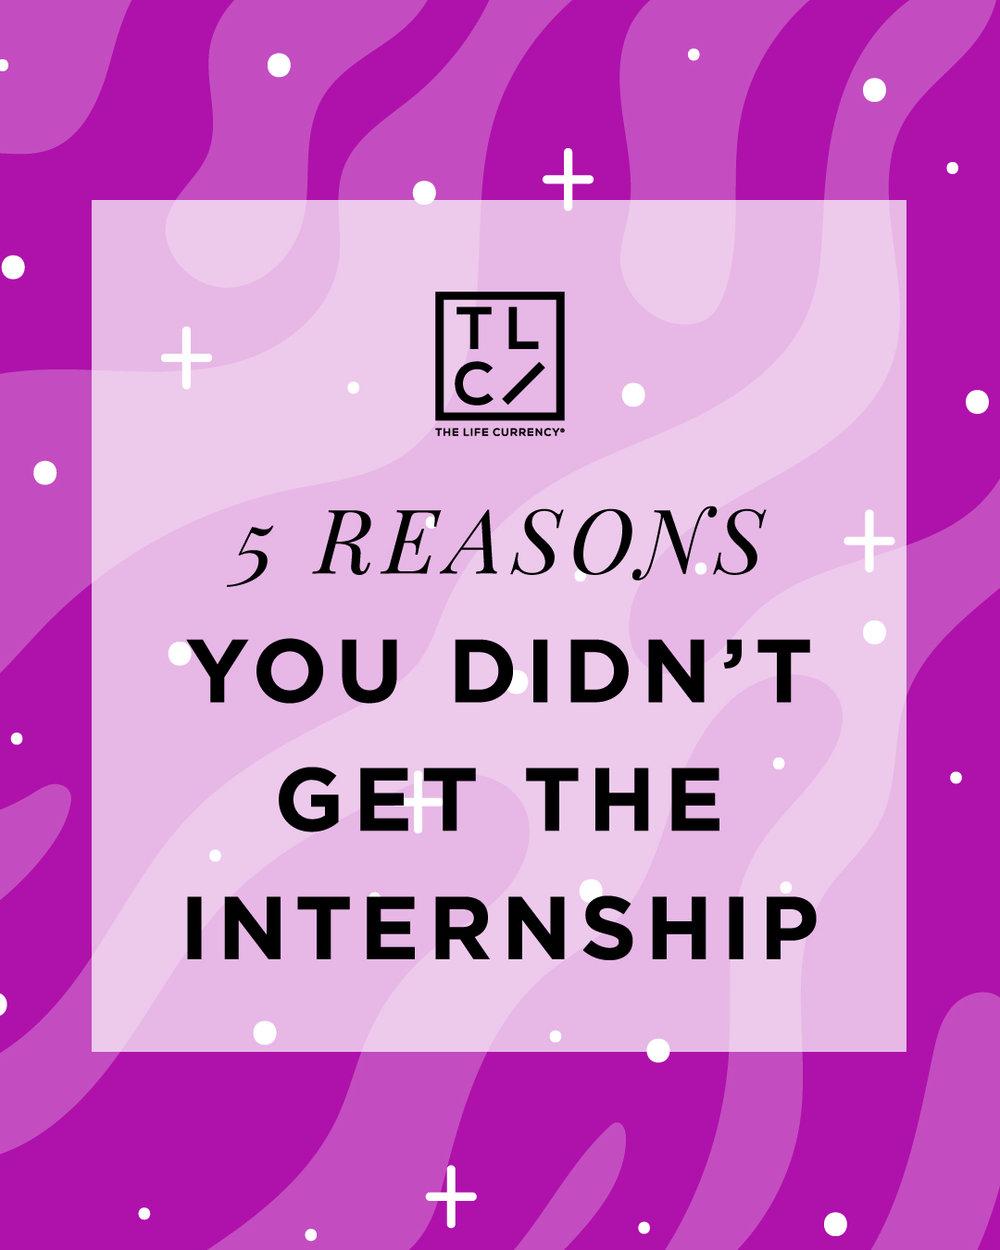 5 Reason's You Didn't Get the Internship